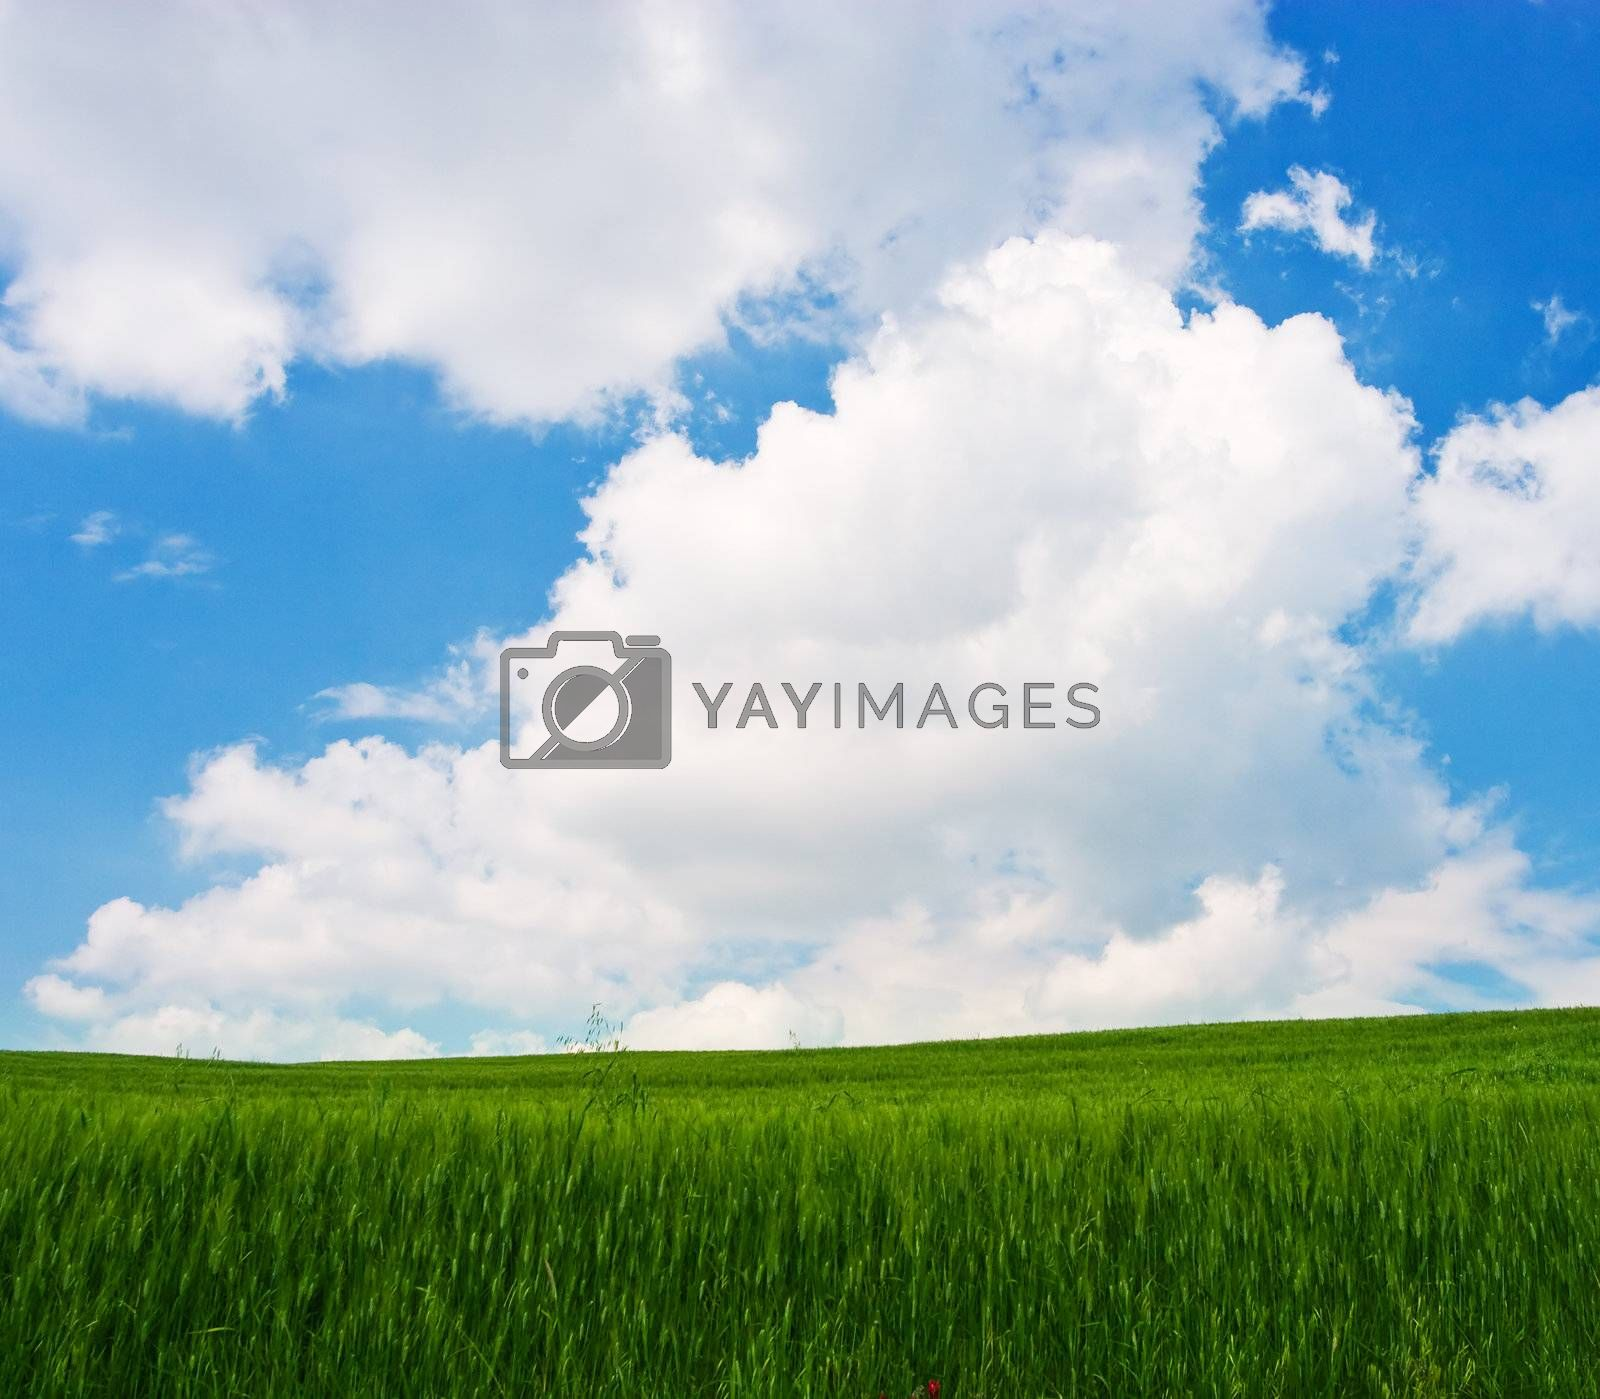 Flowered Landscape by ajn